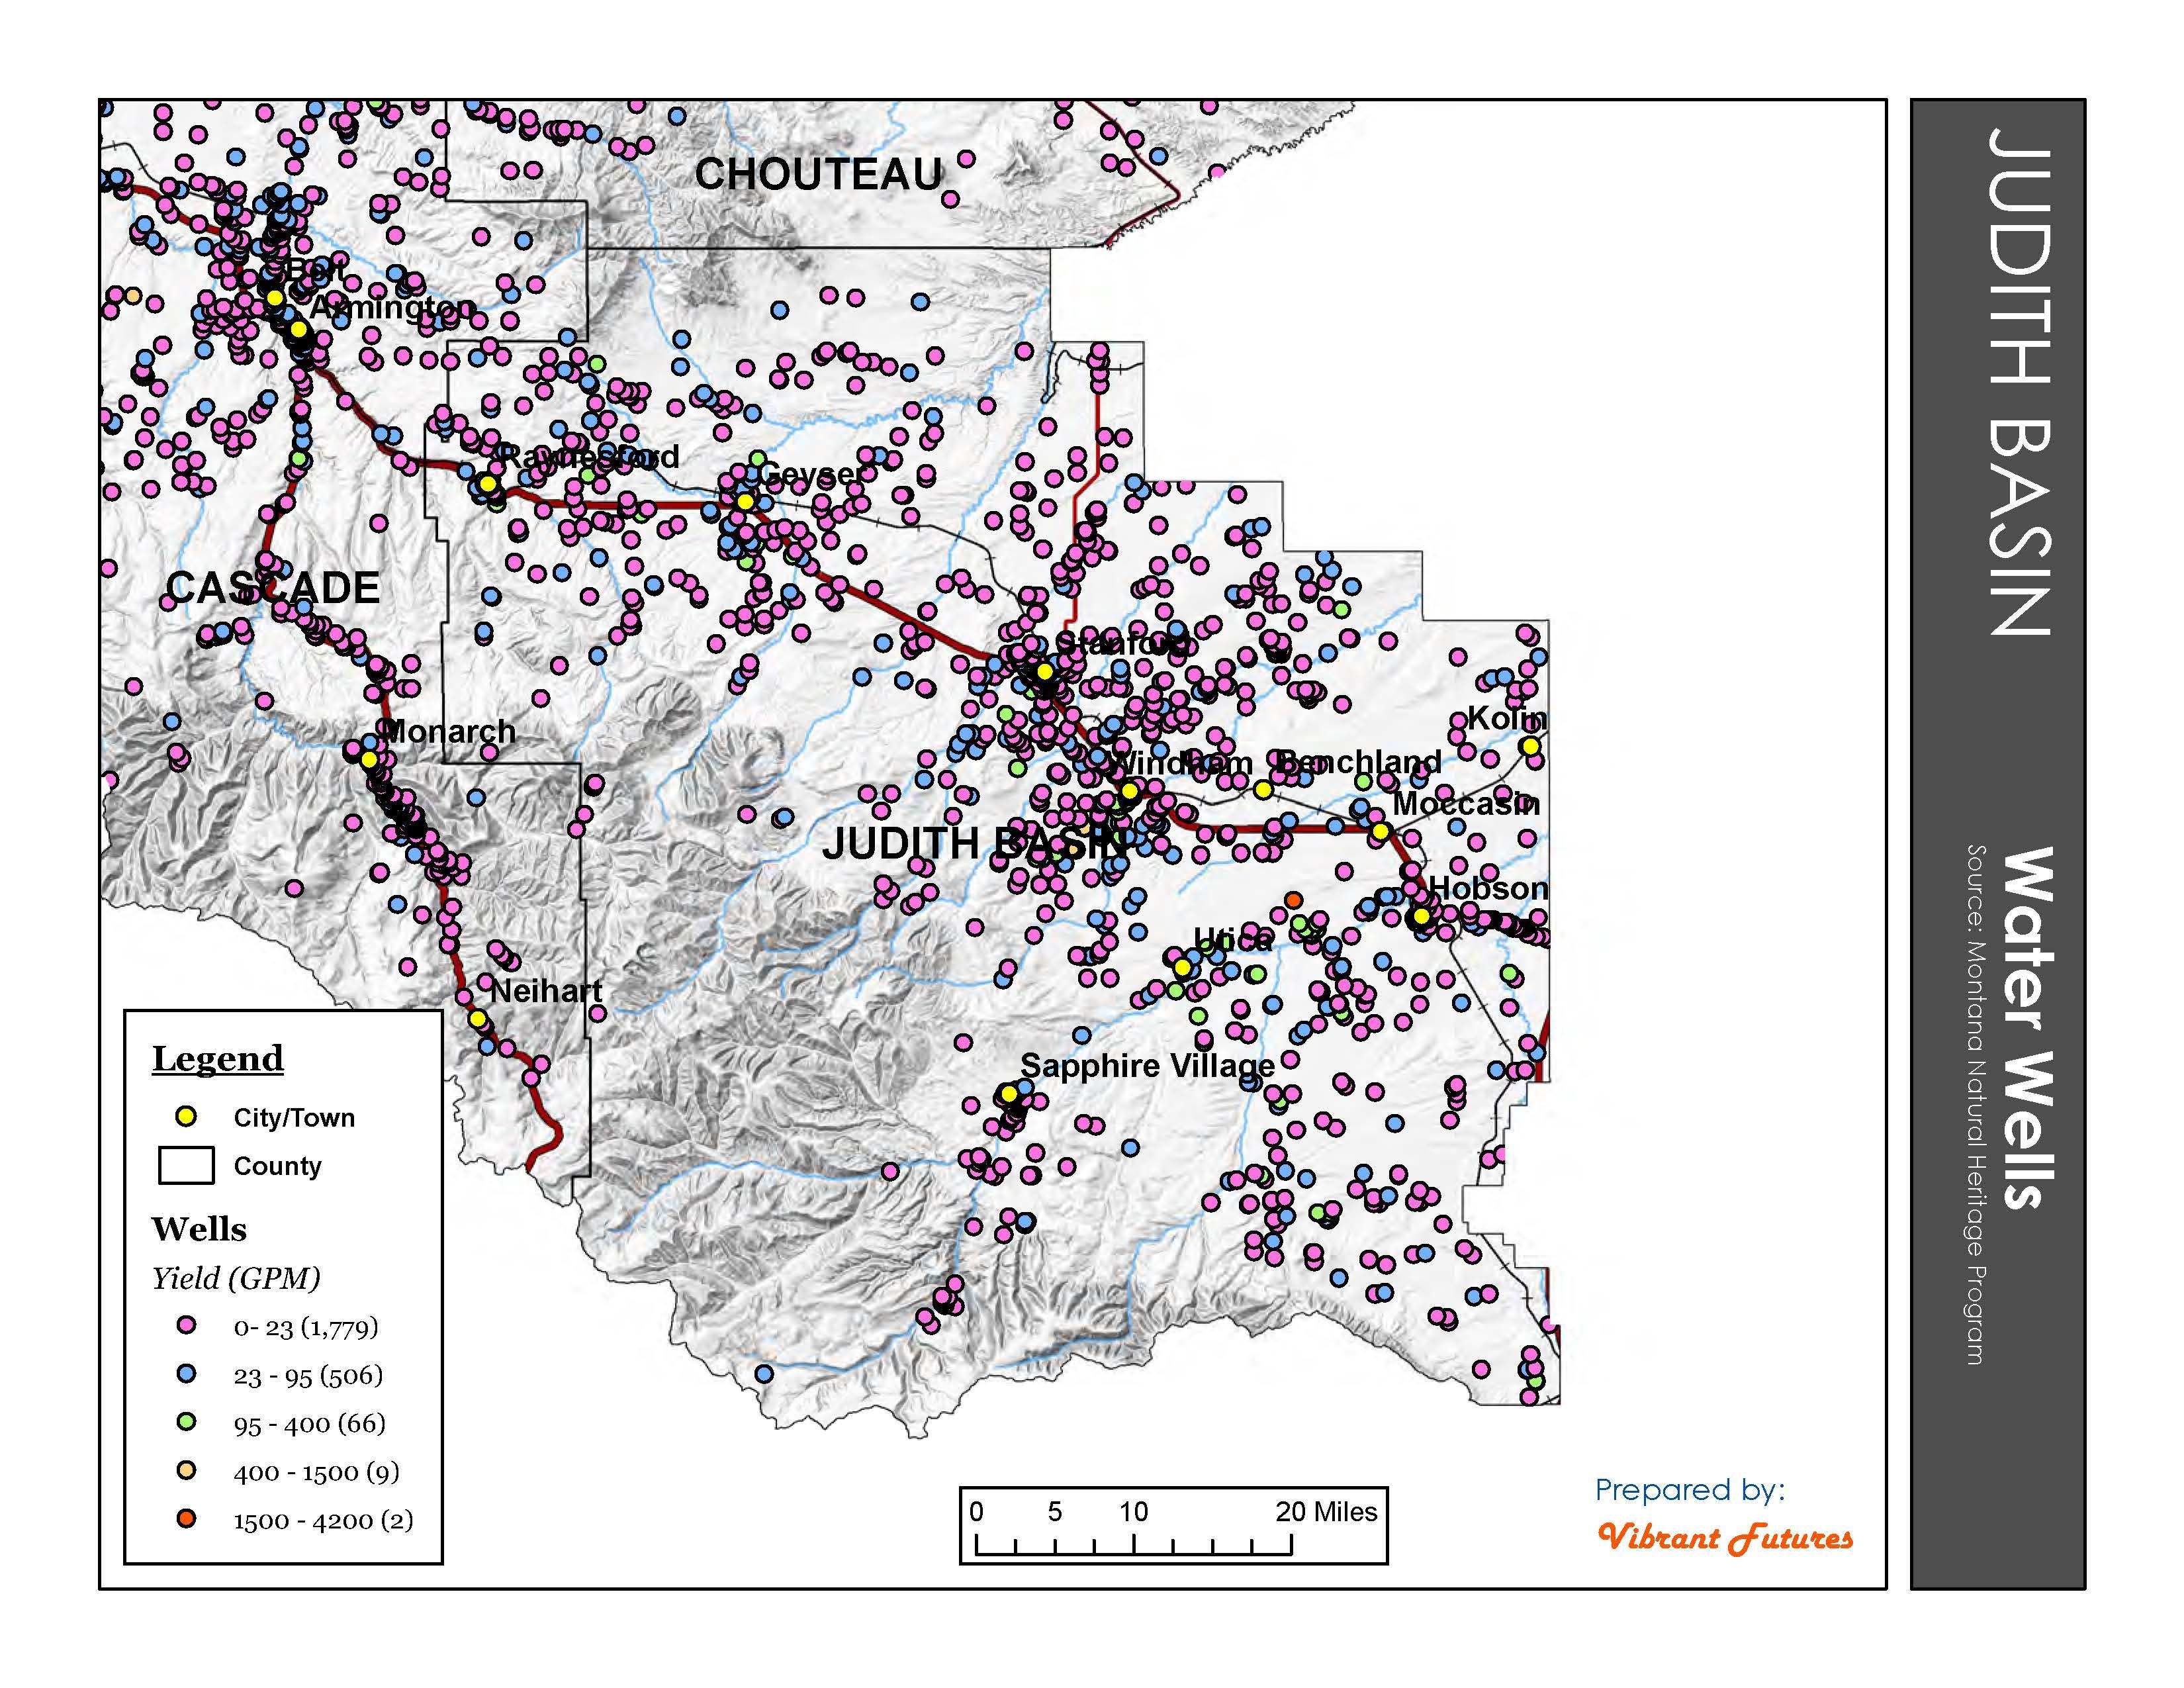 Water Wells Judith Basin County